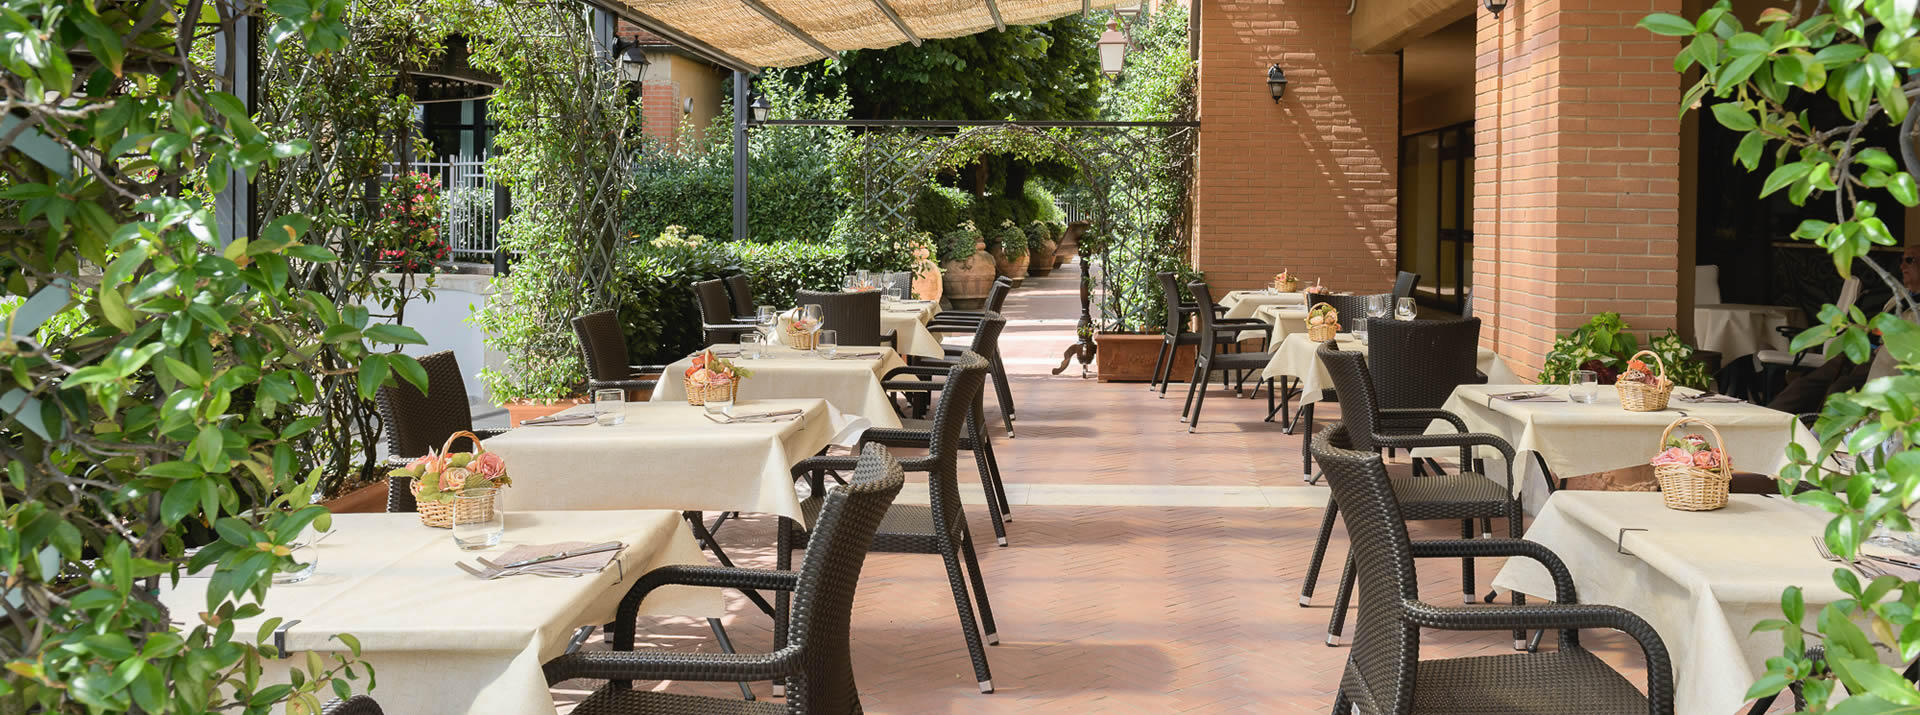 hotelsangregorio it ristorante-pienza 004